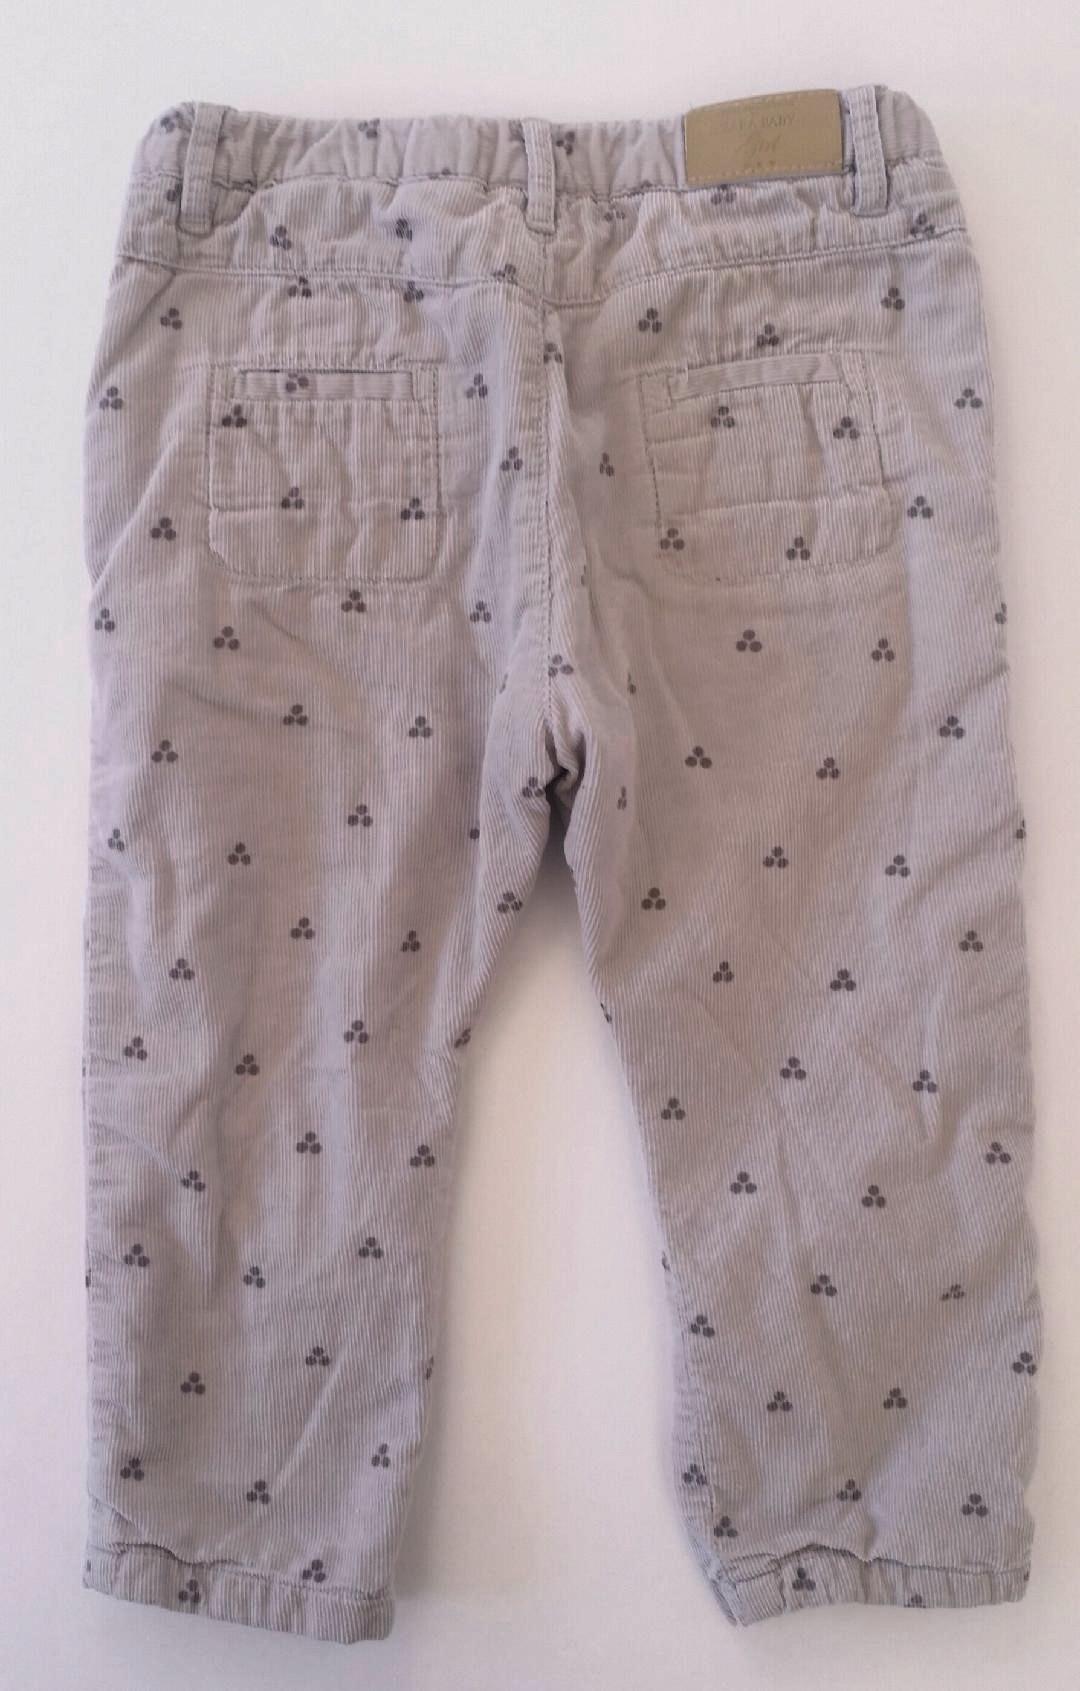 Zara-12-18-MONTHS-Corduroy-Pants_2159433B.jpg